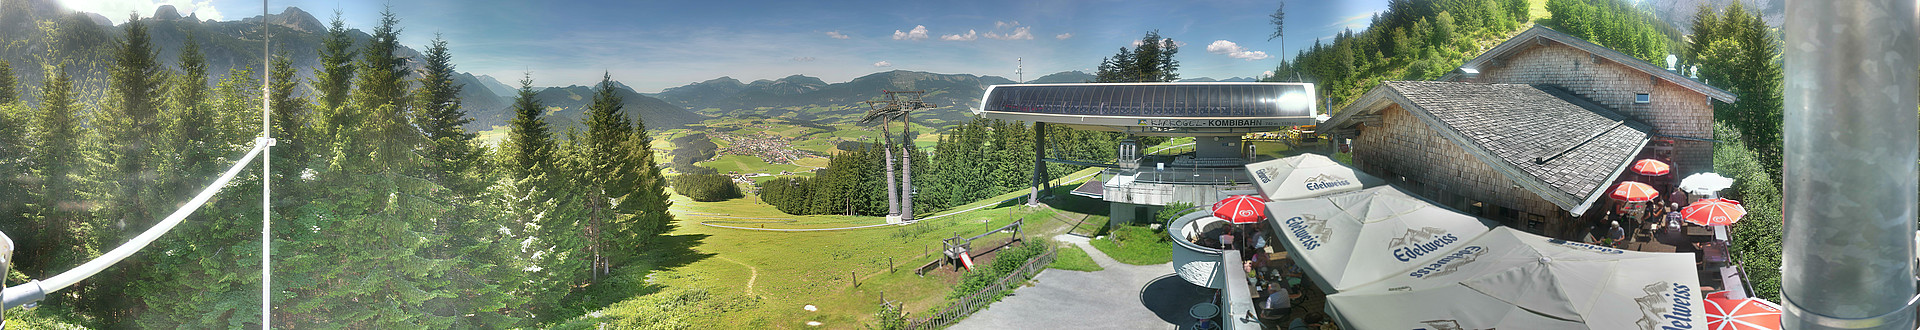 Livebild vom Karkogel Abtenau